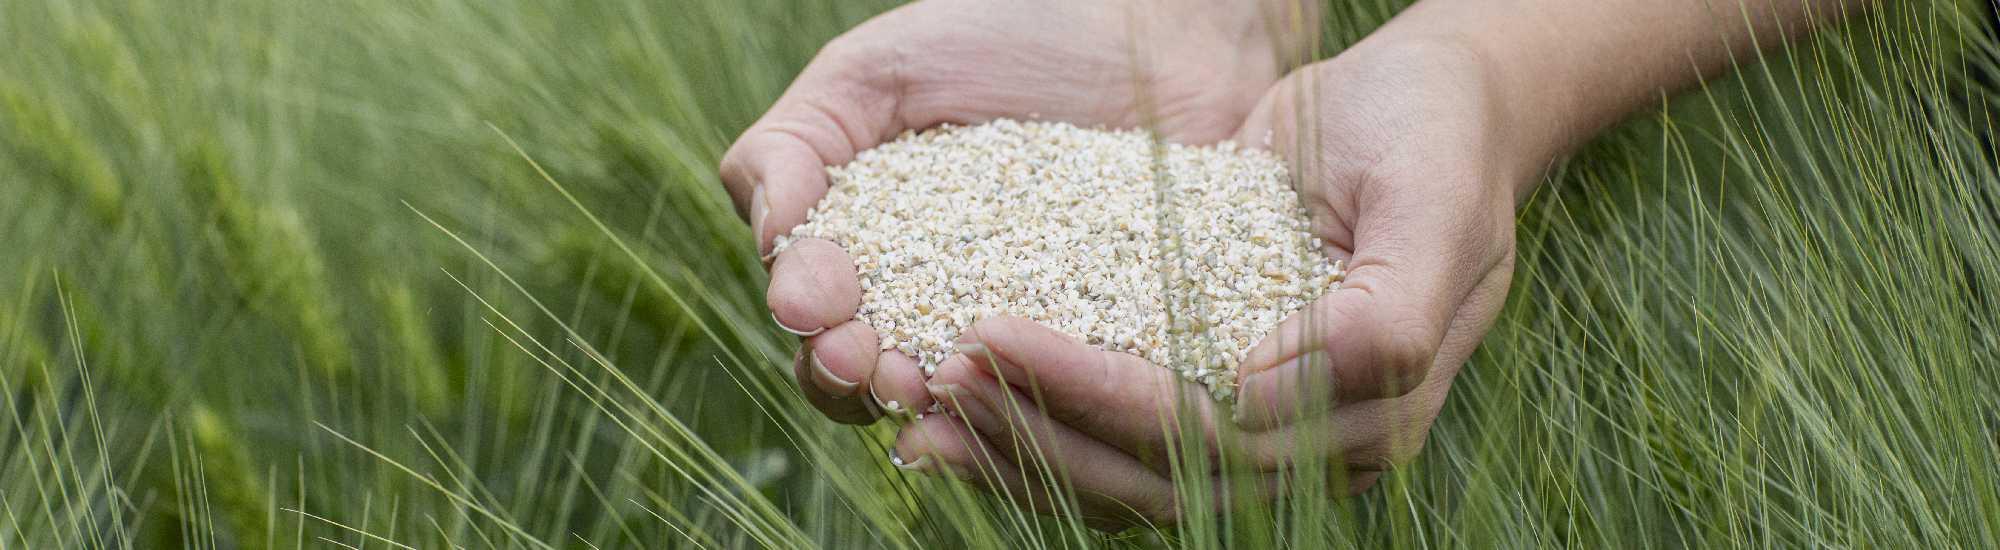 ohrapelto barley field